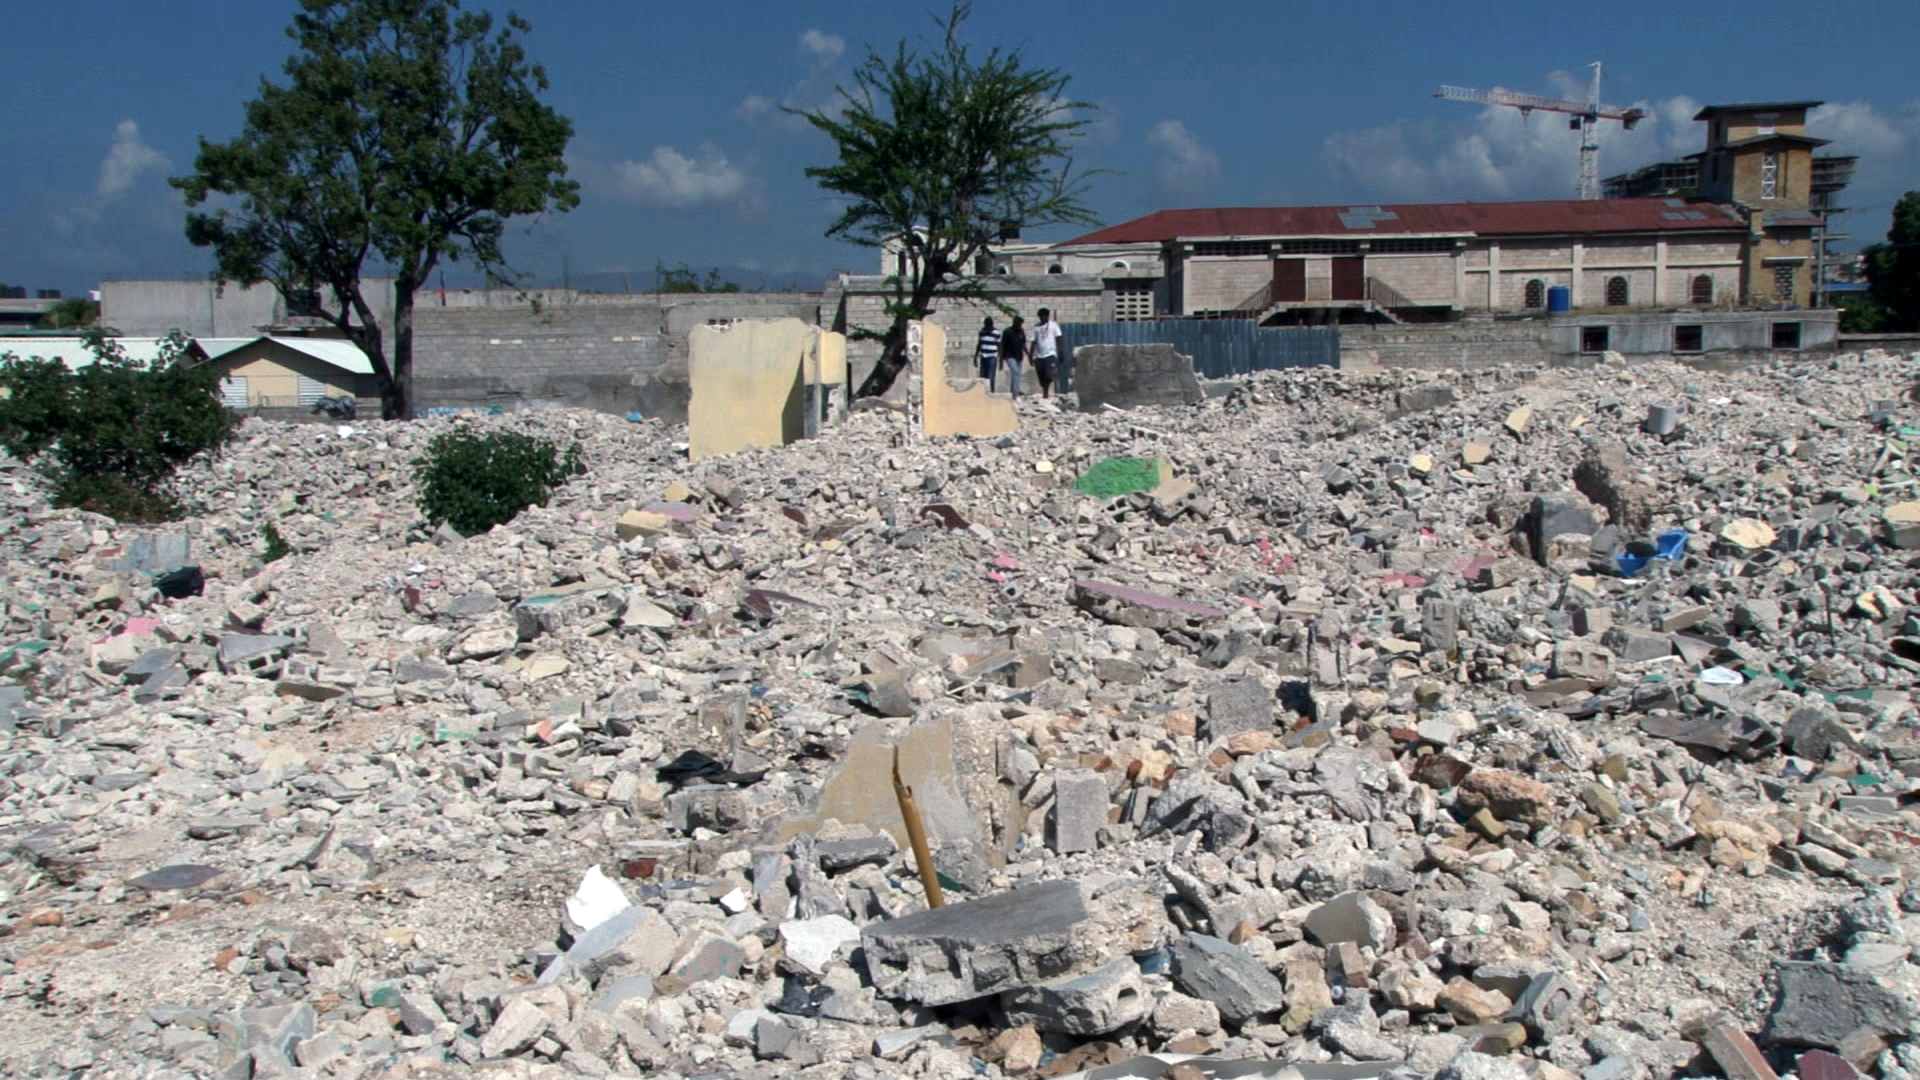 Haitian-made films, Day 3 of 10, commemorating Haiti earthquake through Haitian eyes and ears